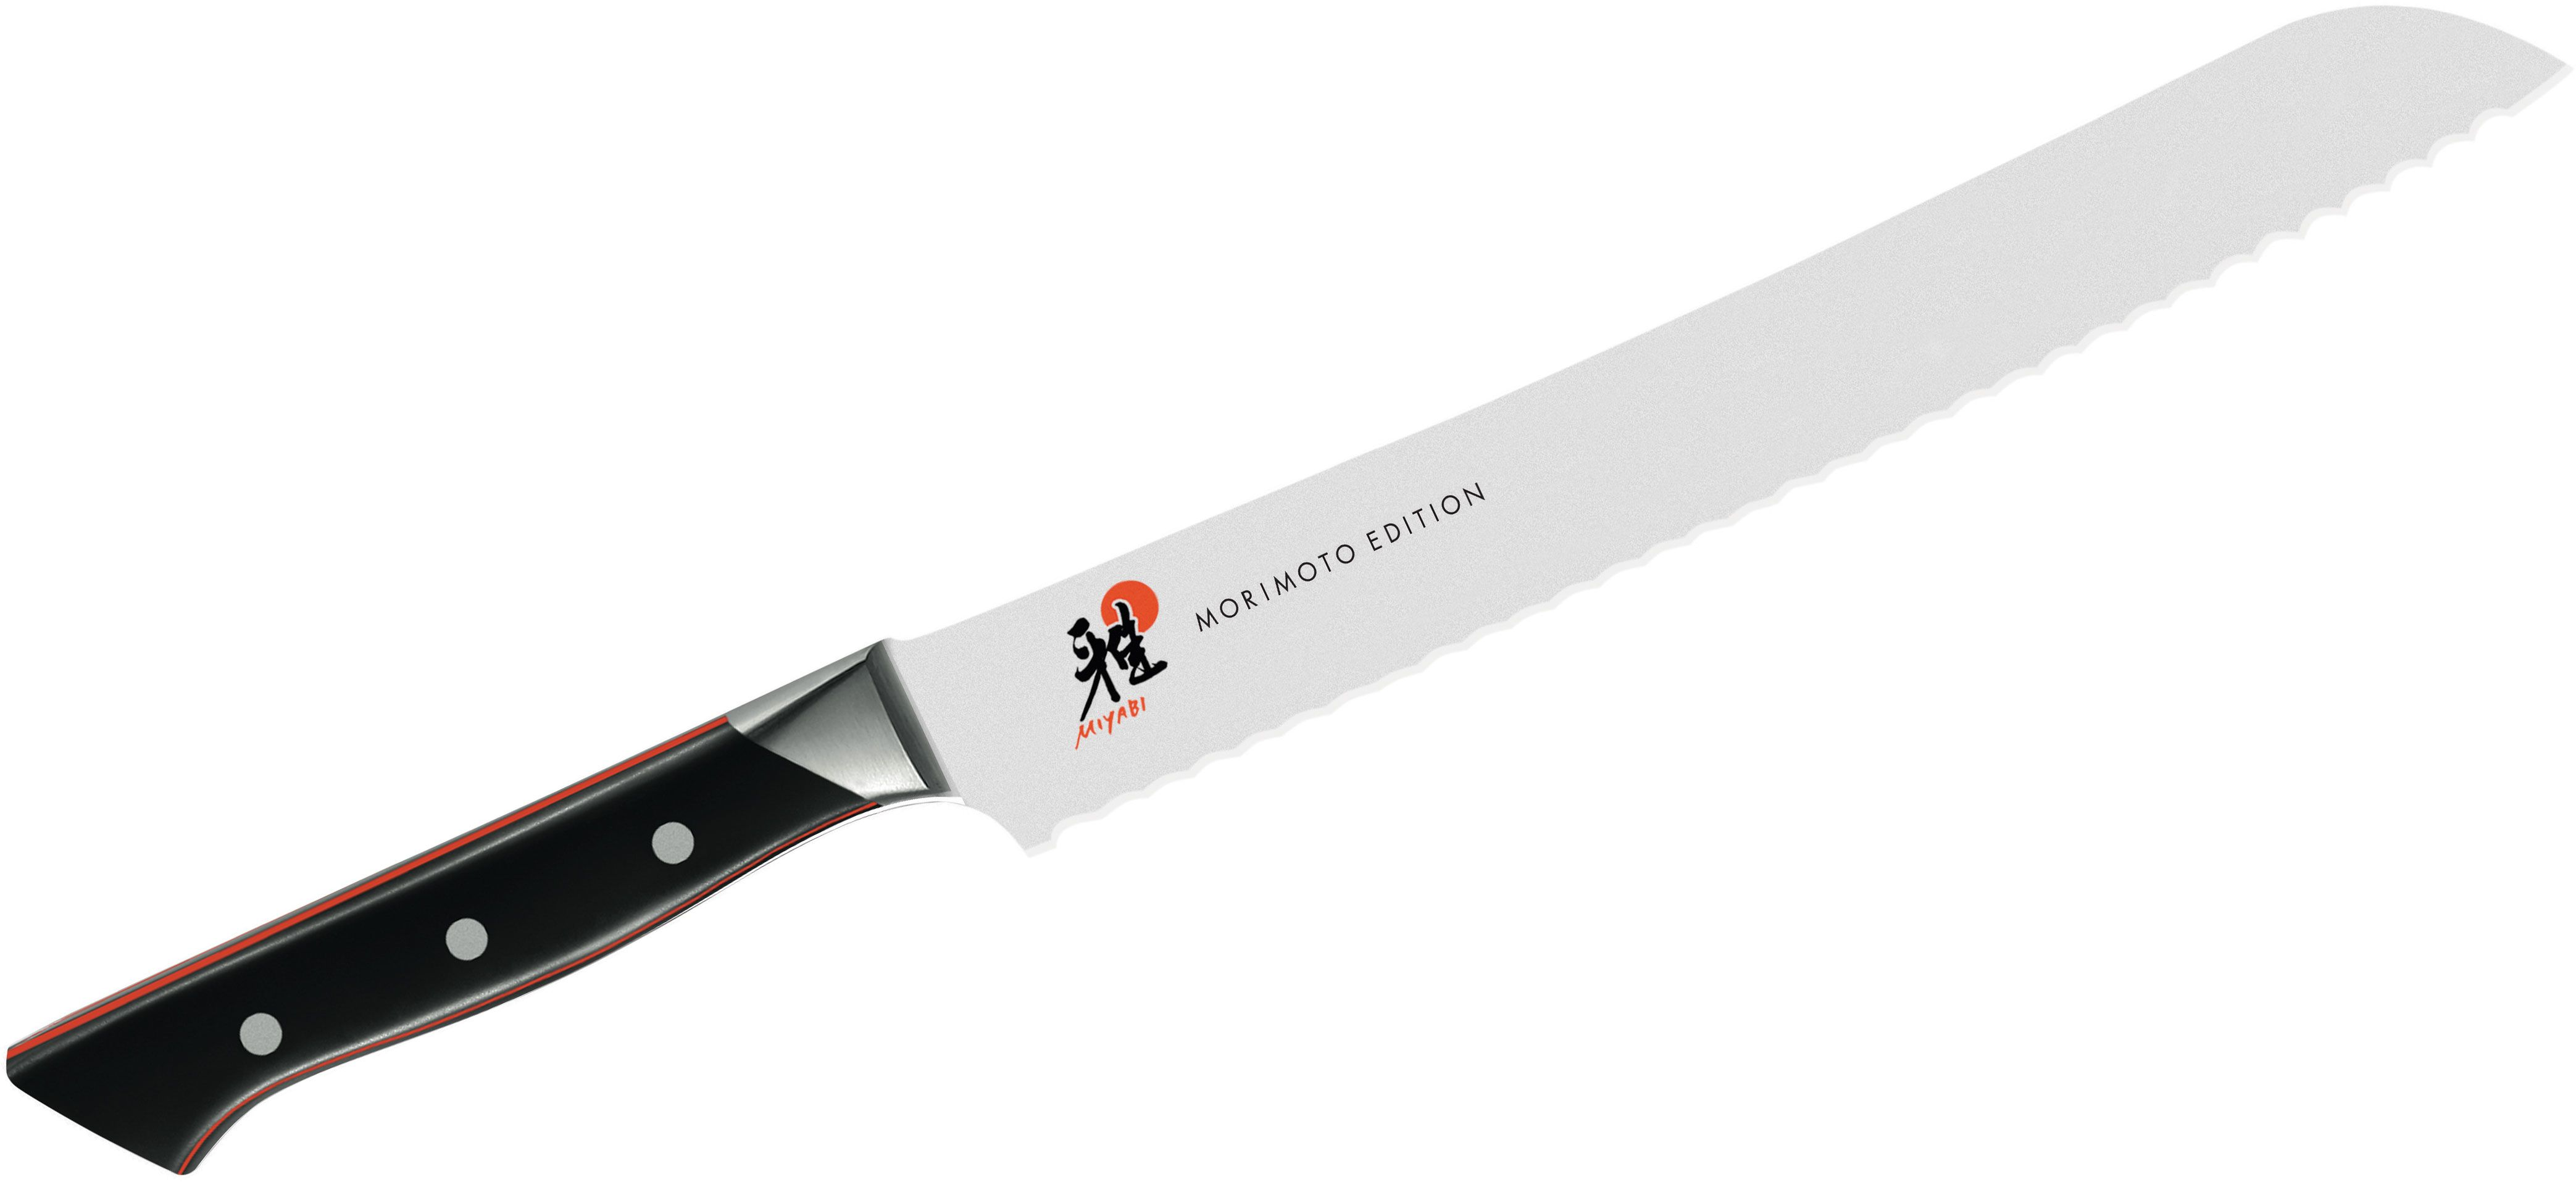 Zwilling J.A. Henckels Miyabi Red 600S Morimoto 9.5 inch Bread Knife